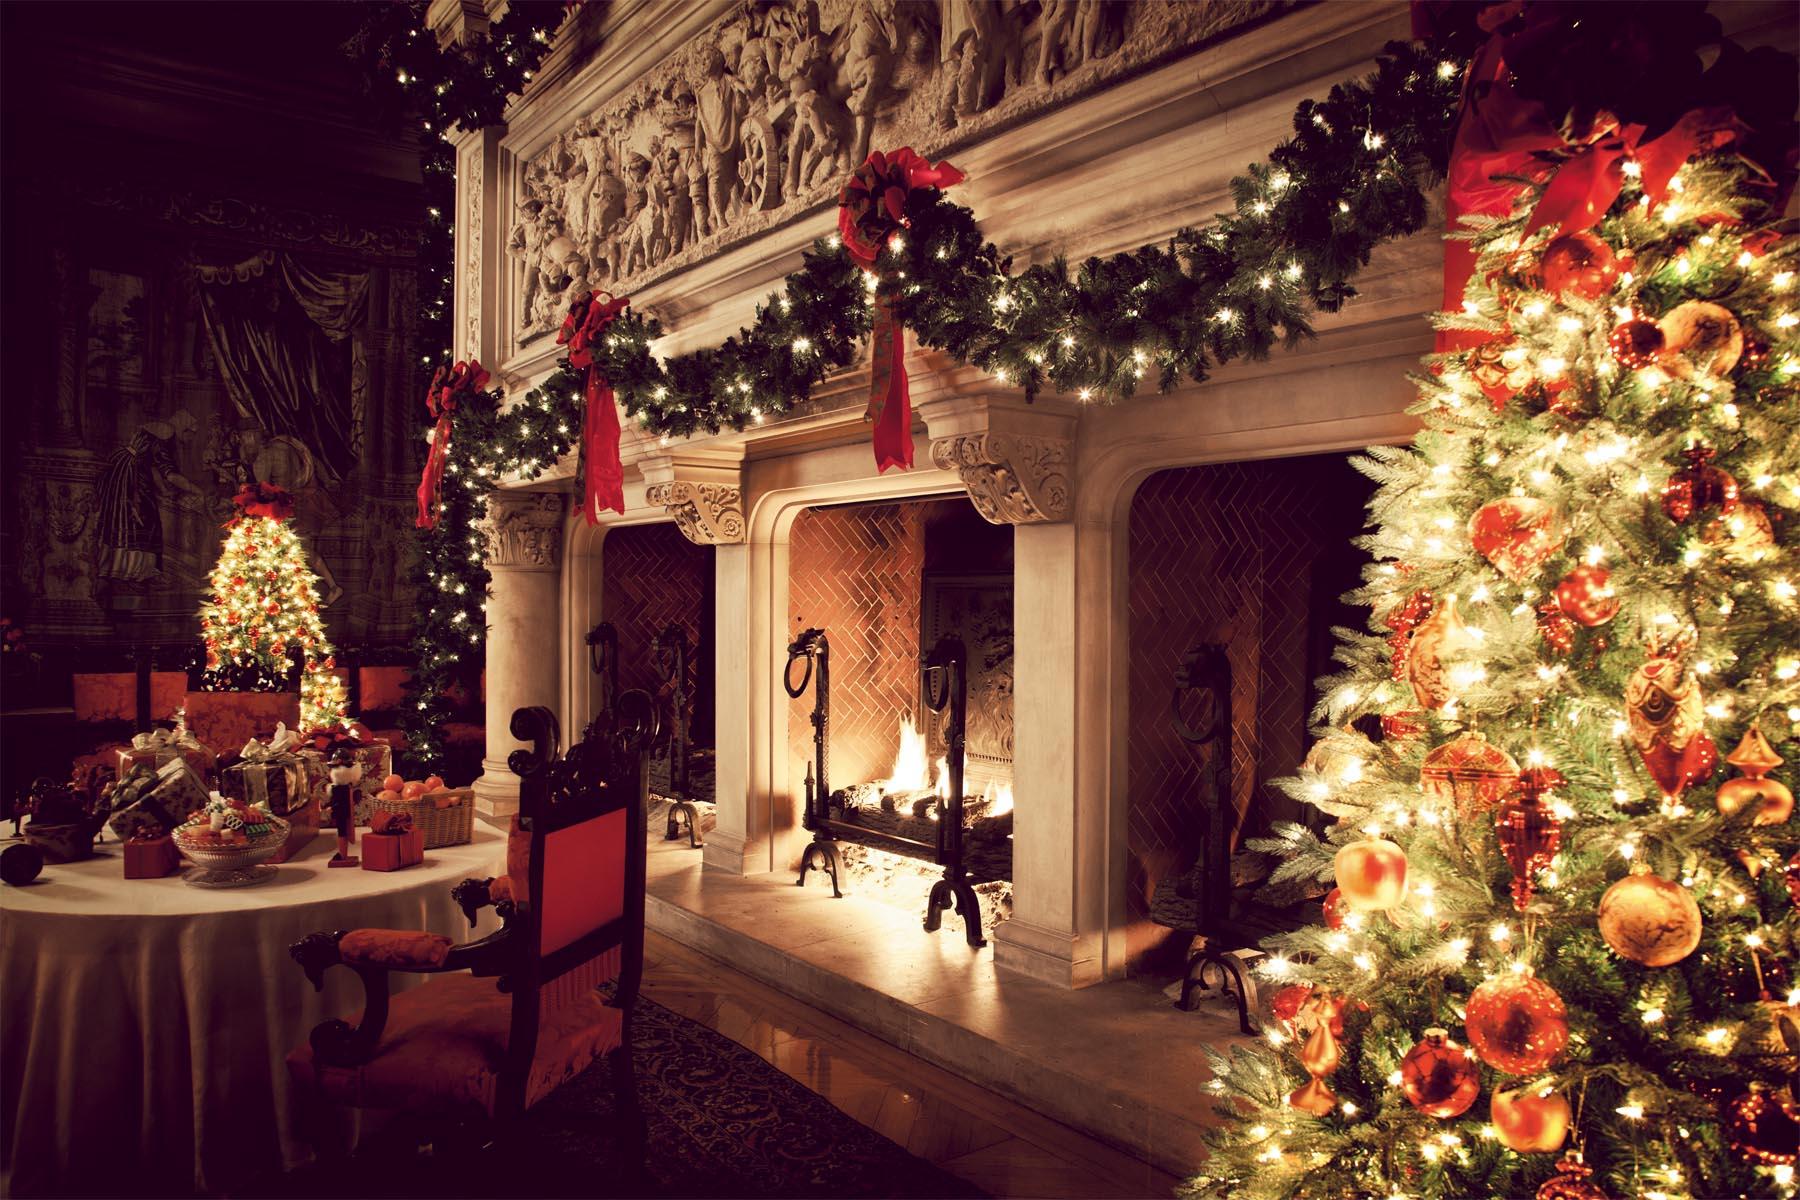 christmas fireplace fire holiday festive decorations j wallpaper 1800x1200